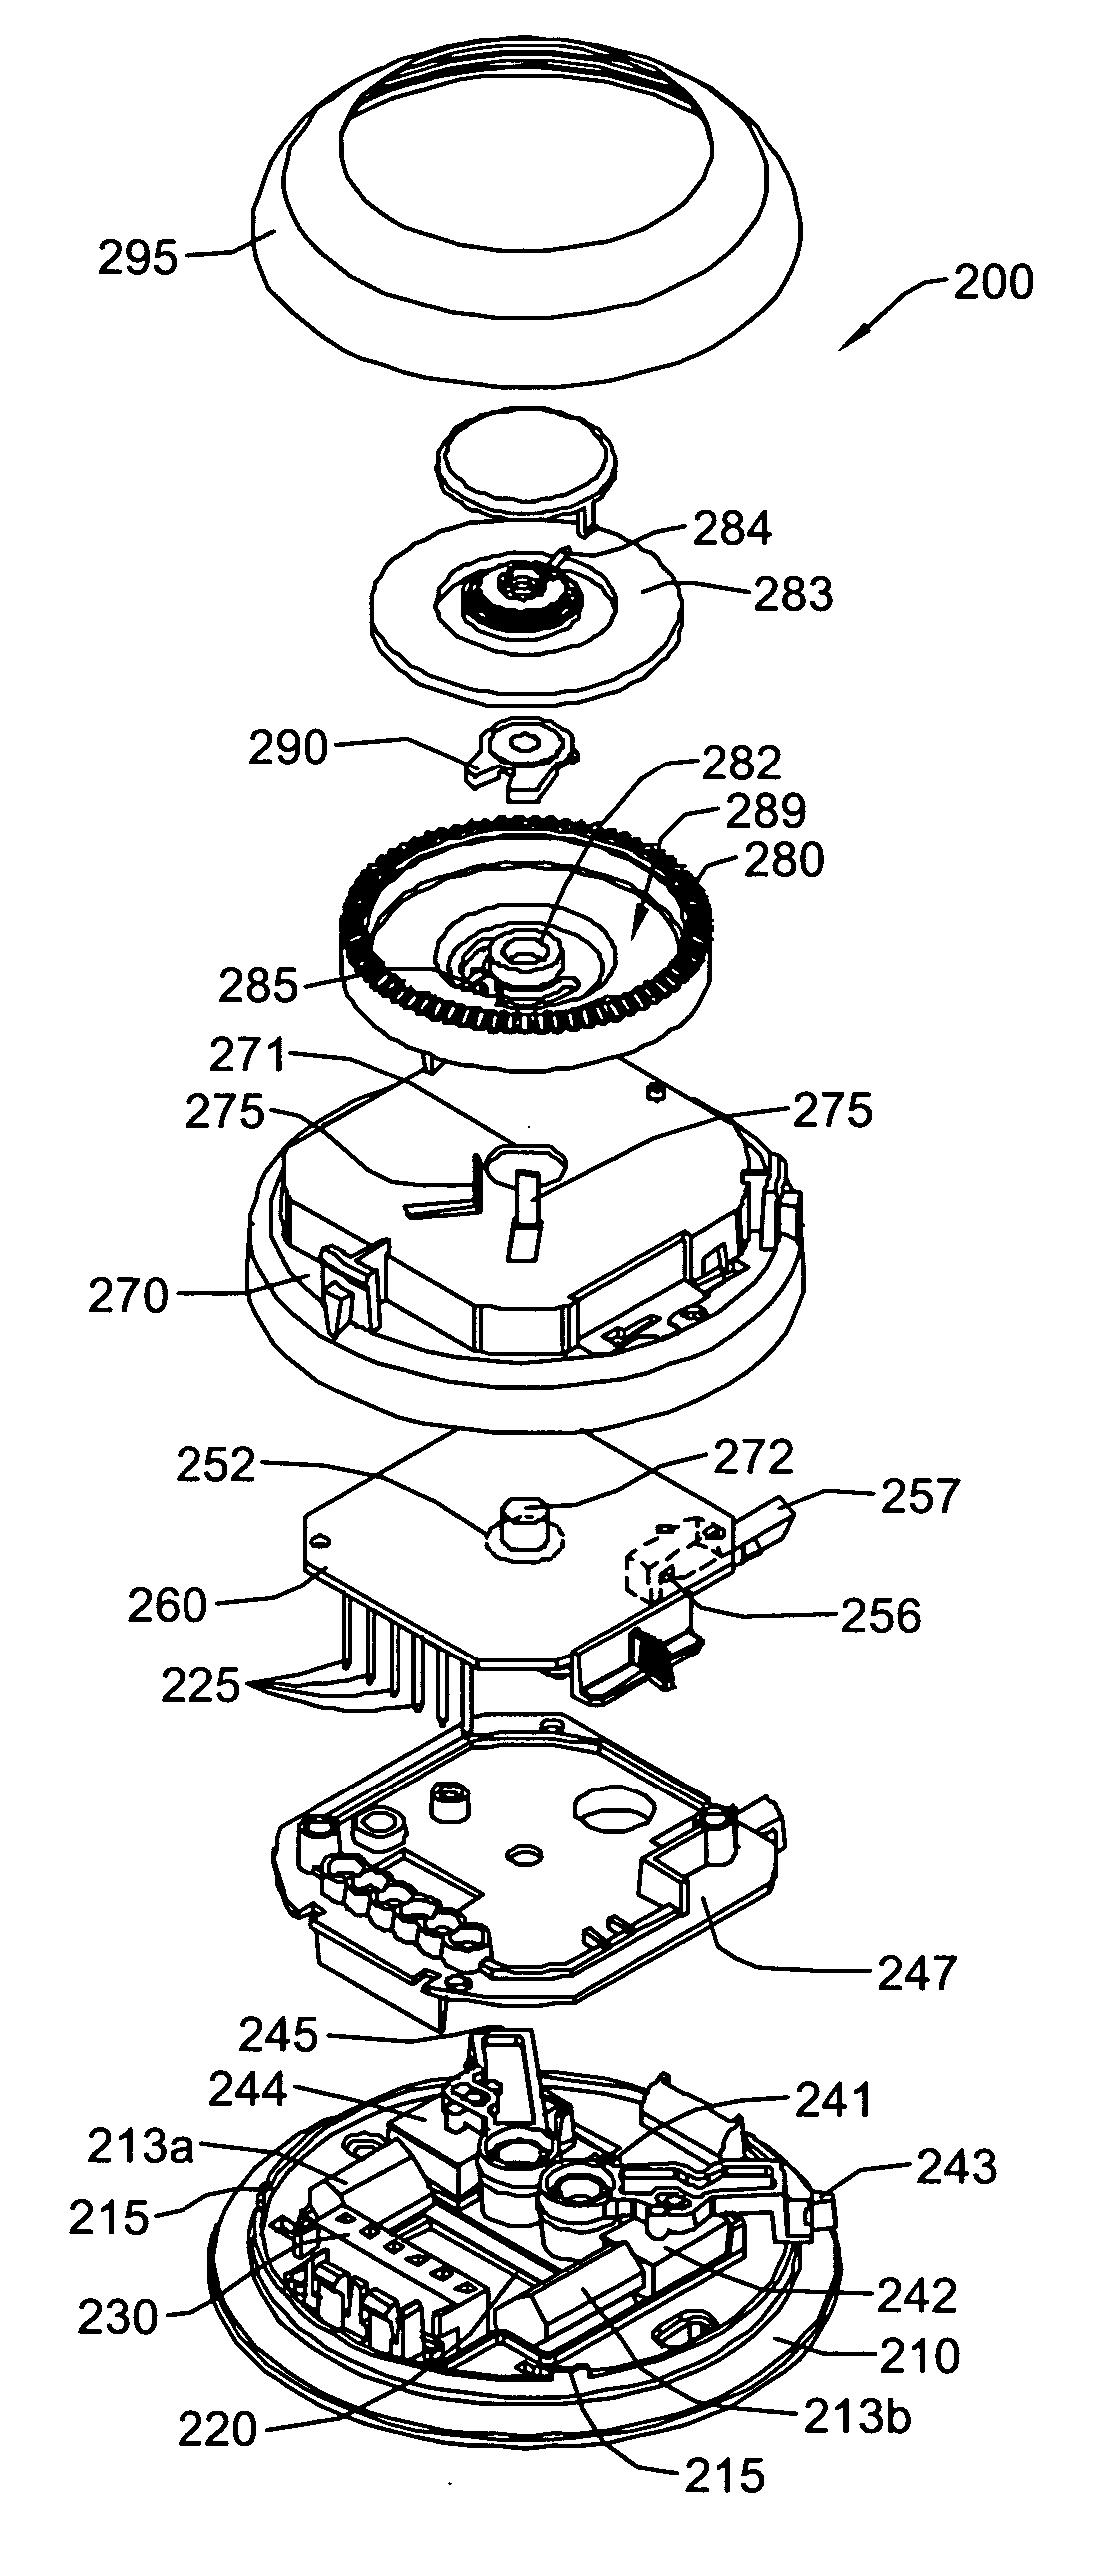 12 Volt Mechanical Thermostat